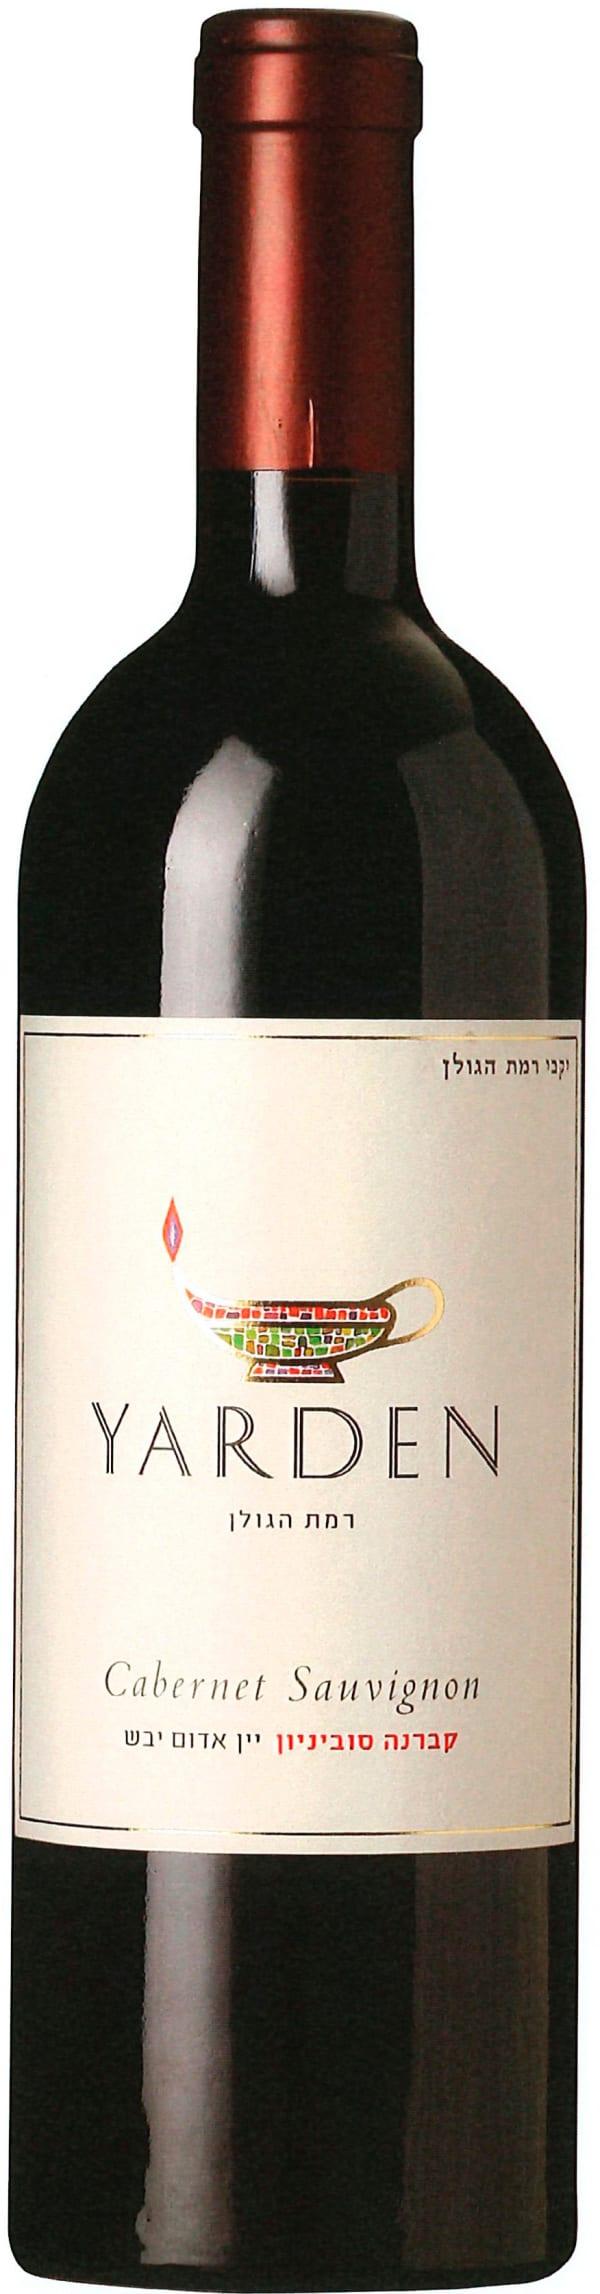 Yarden Cabernet Sauvignon 2016